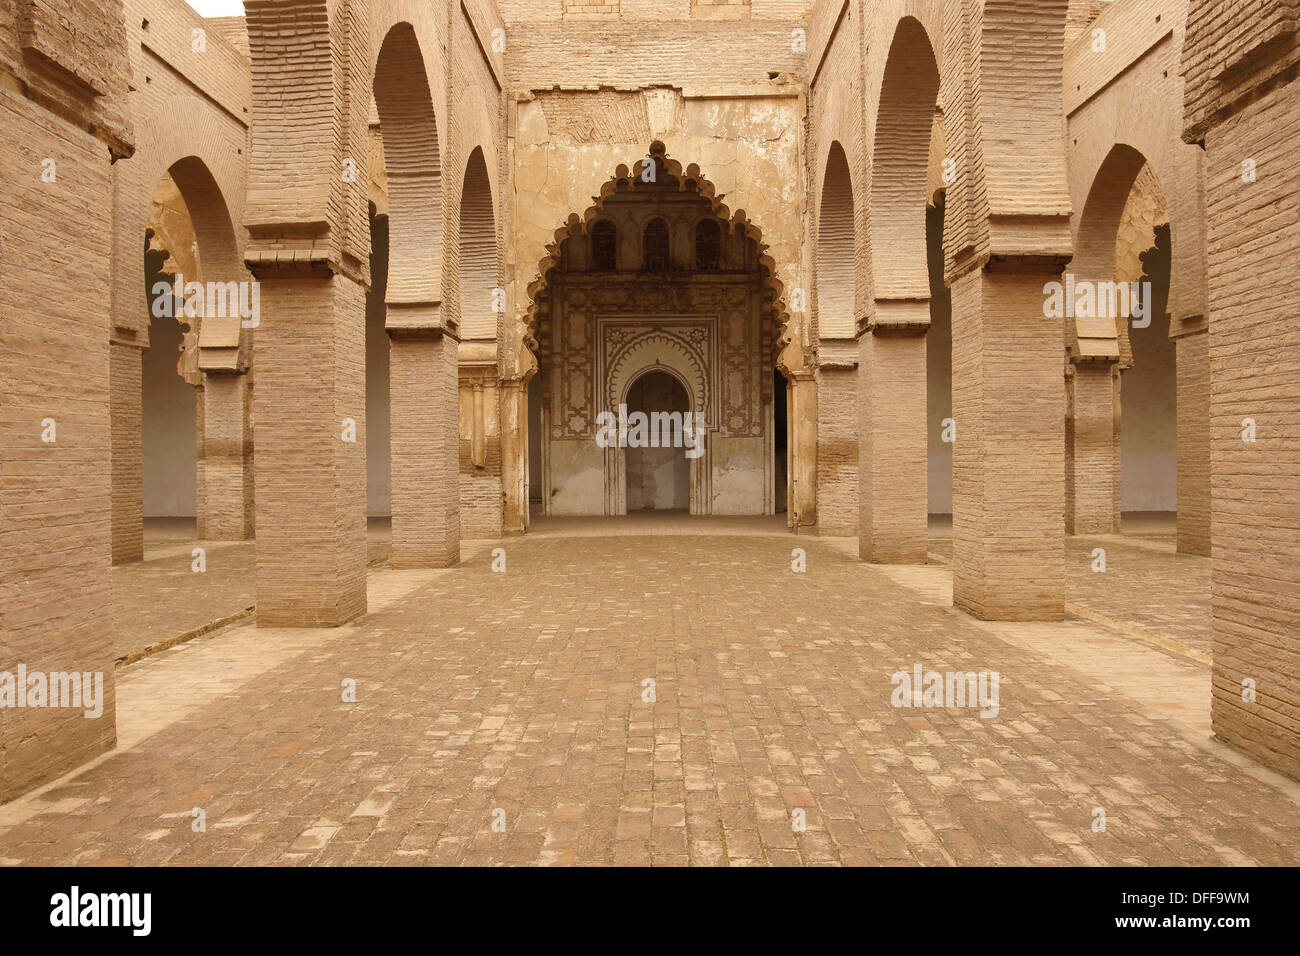 Tin Mal, la Mosquée de Tinmel, XII siècle, Ifouriren Road, Tizi-n-Test, Atlas, Maroc, Afrique Photo Stock